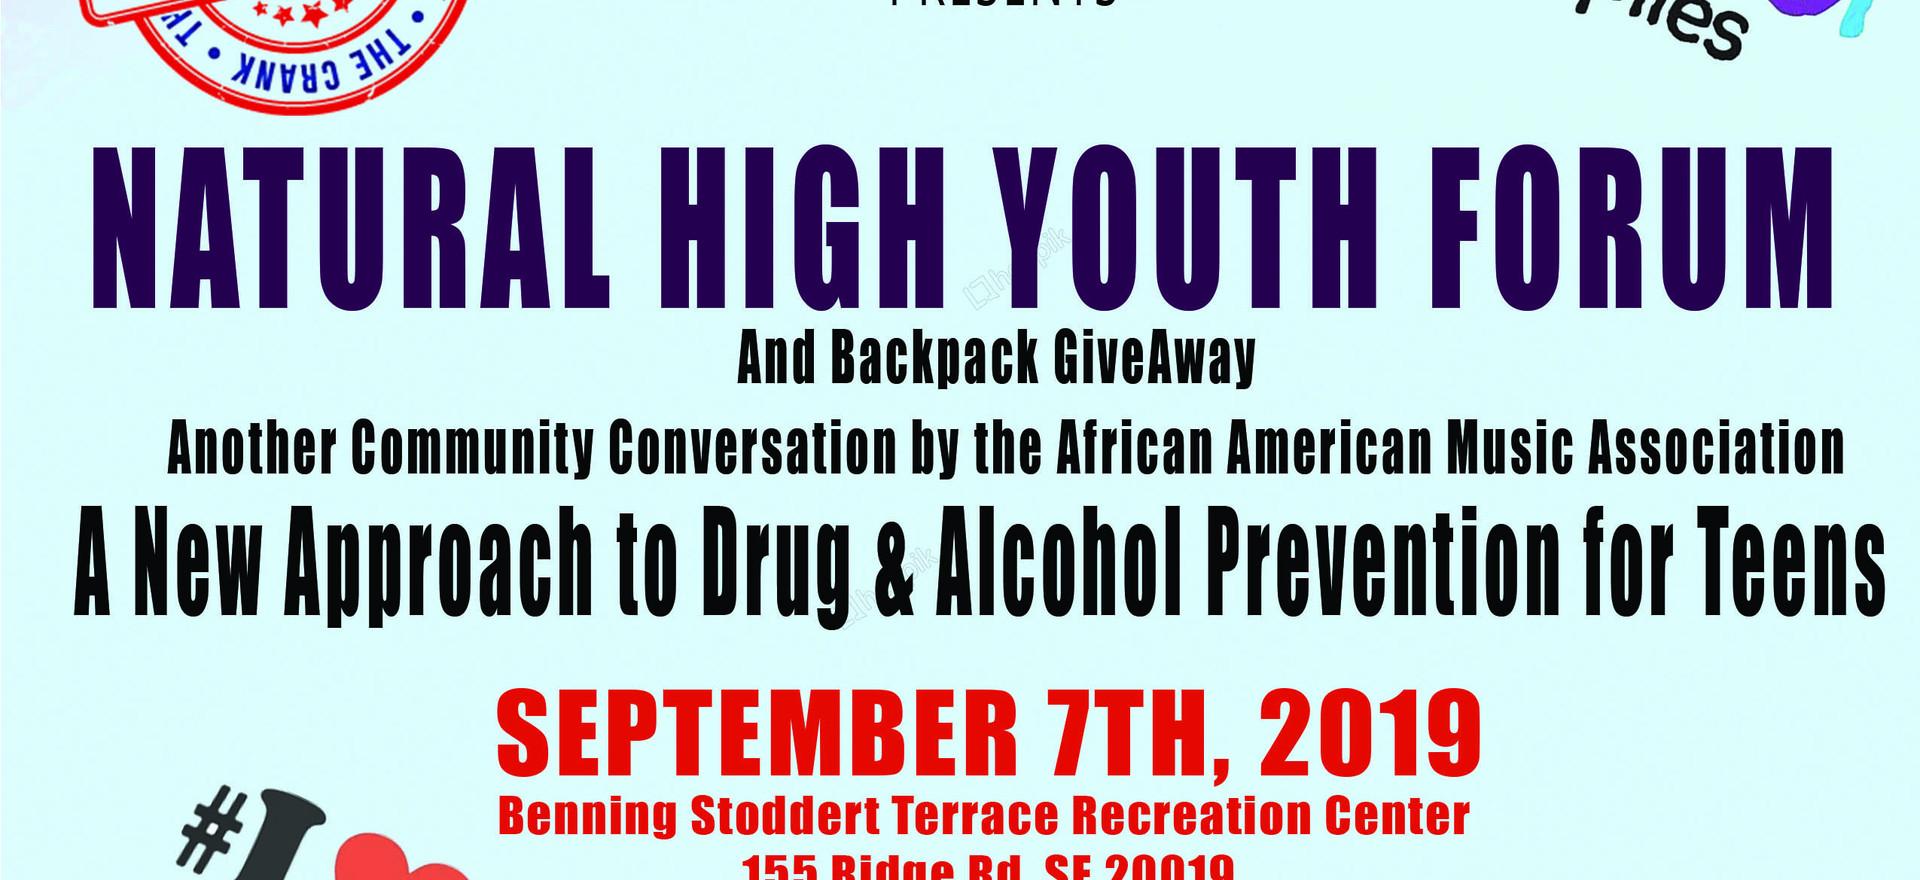 natral high YOUTH FORUM FINAL 9719.jpg